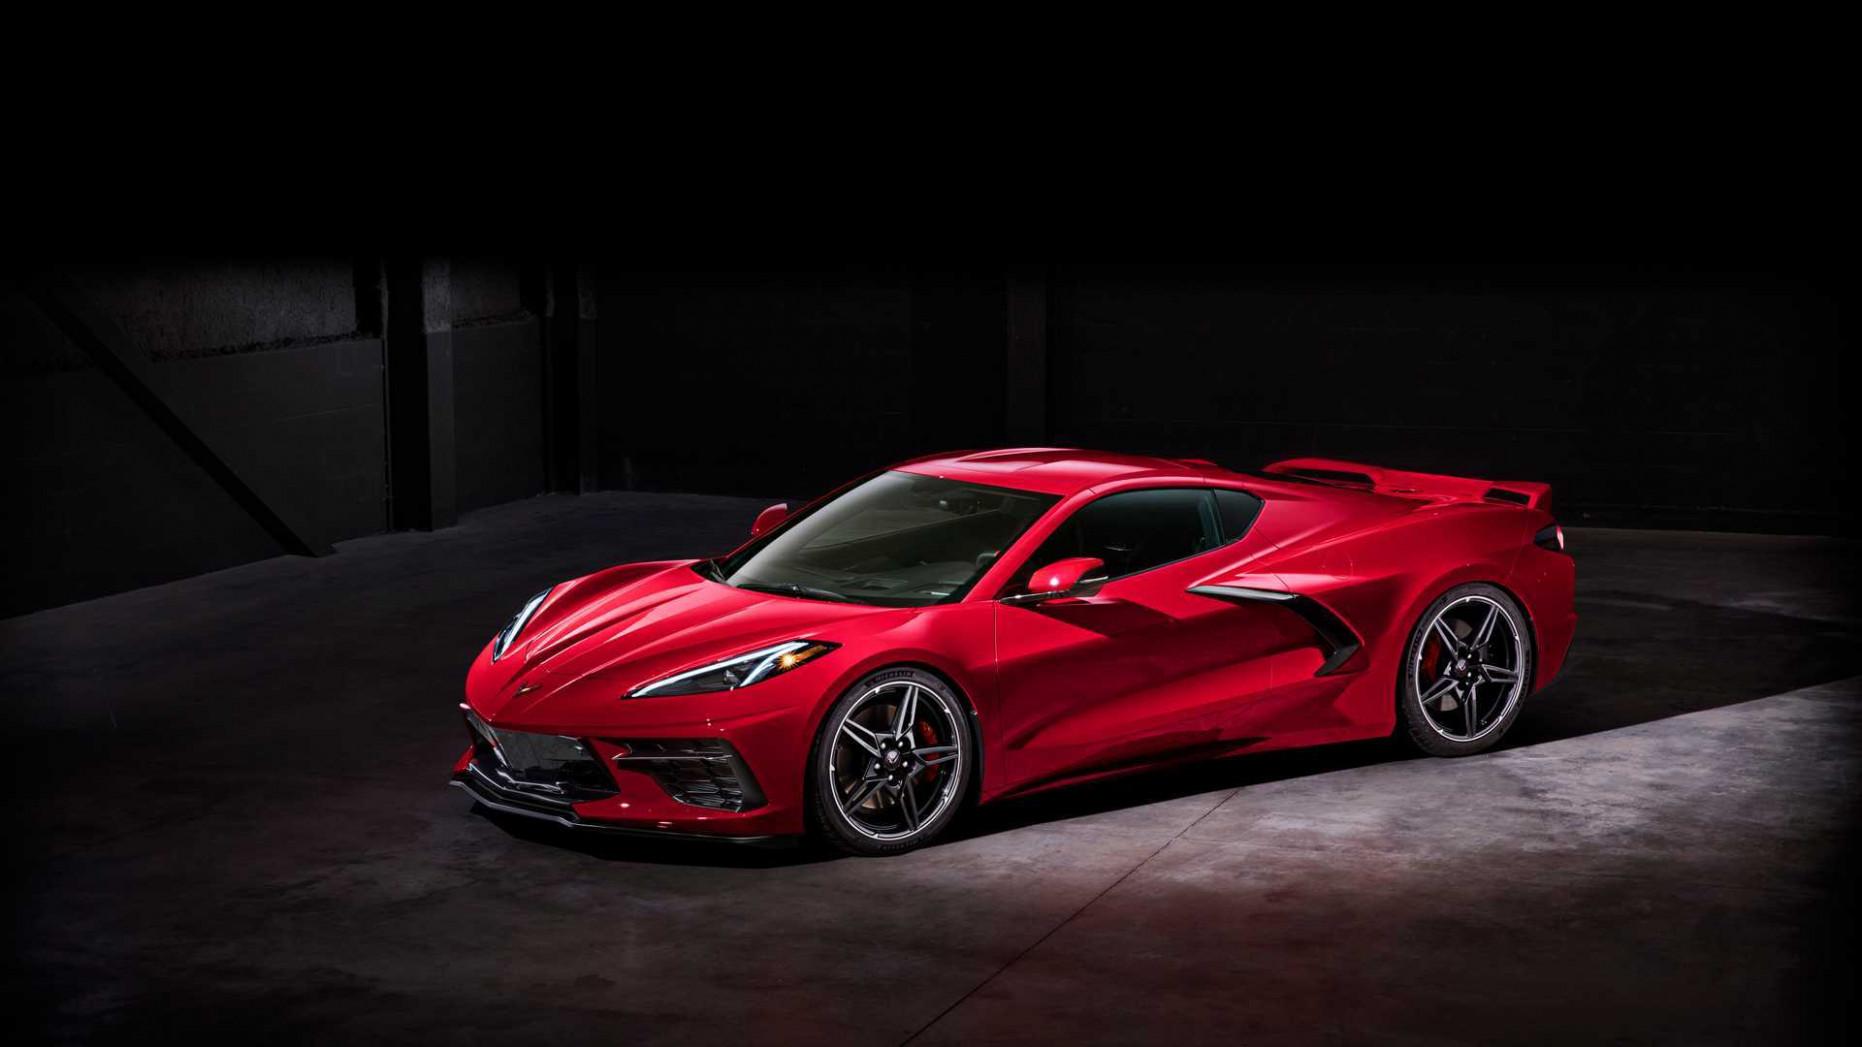 Style 2022 Chevrolet Corvette Zora Zr1